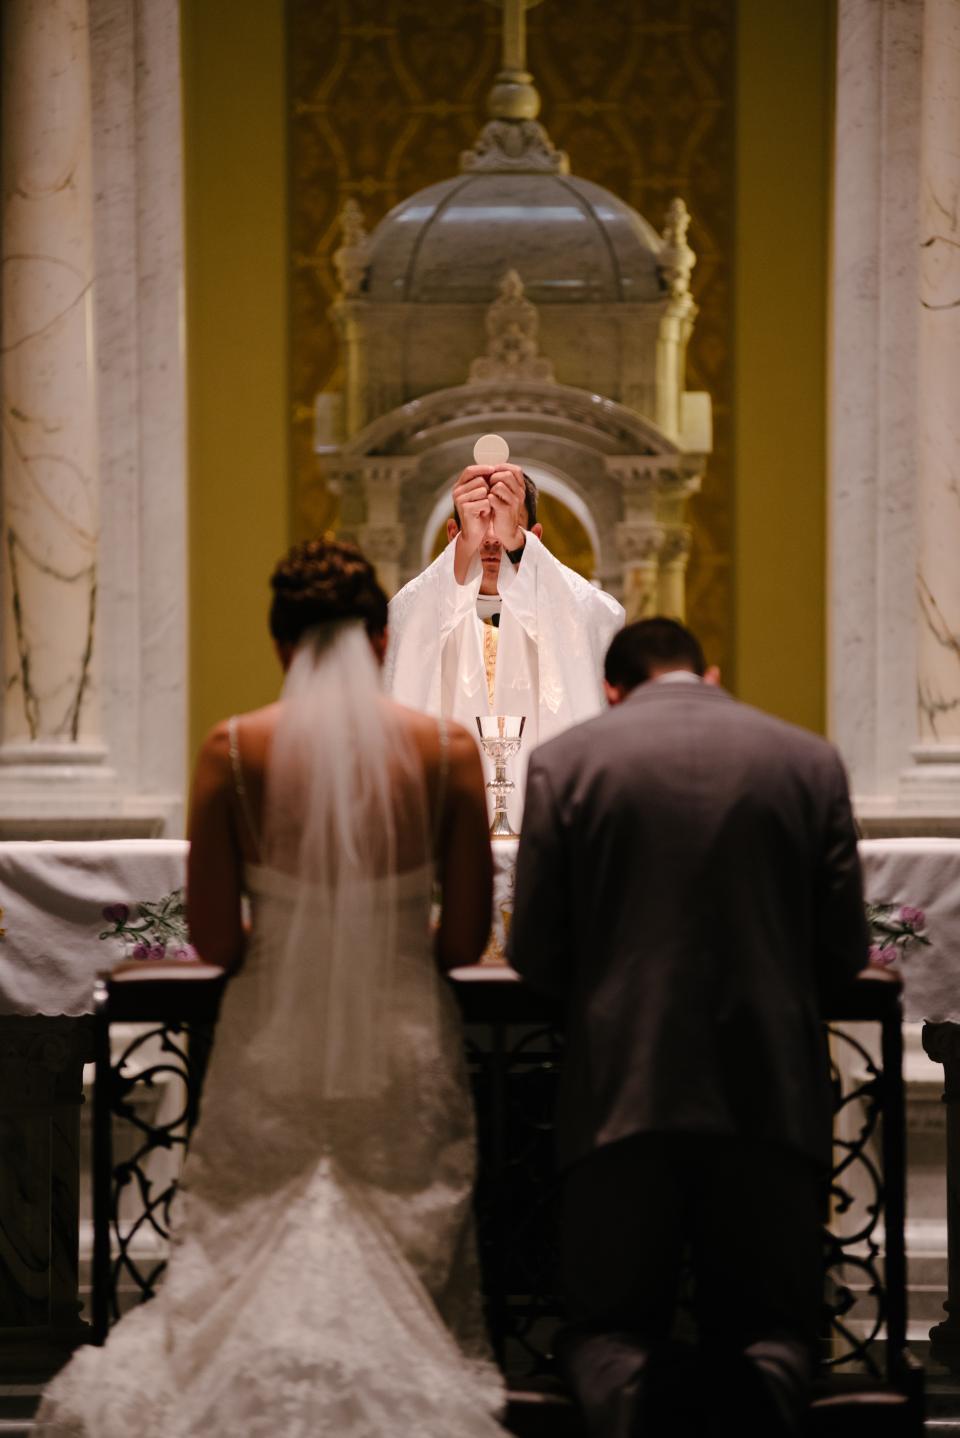 wedding, mass, priest, bride, groom, gown, suit, altar, hostia, ceremony, celebration, marriage, kneel